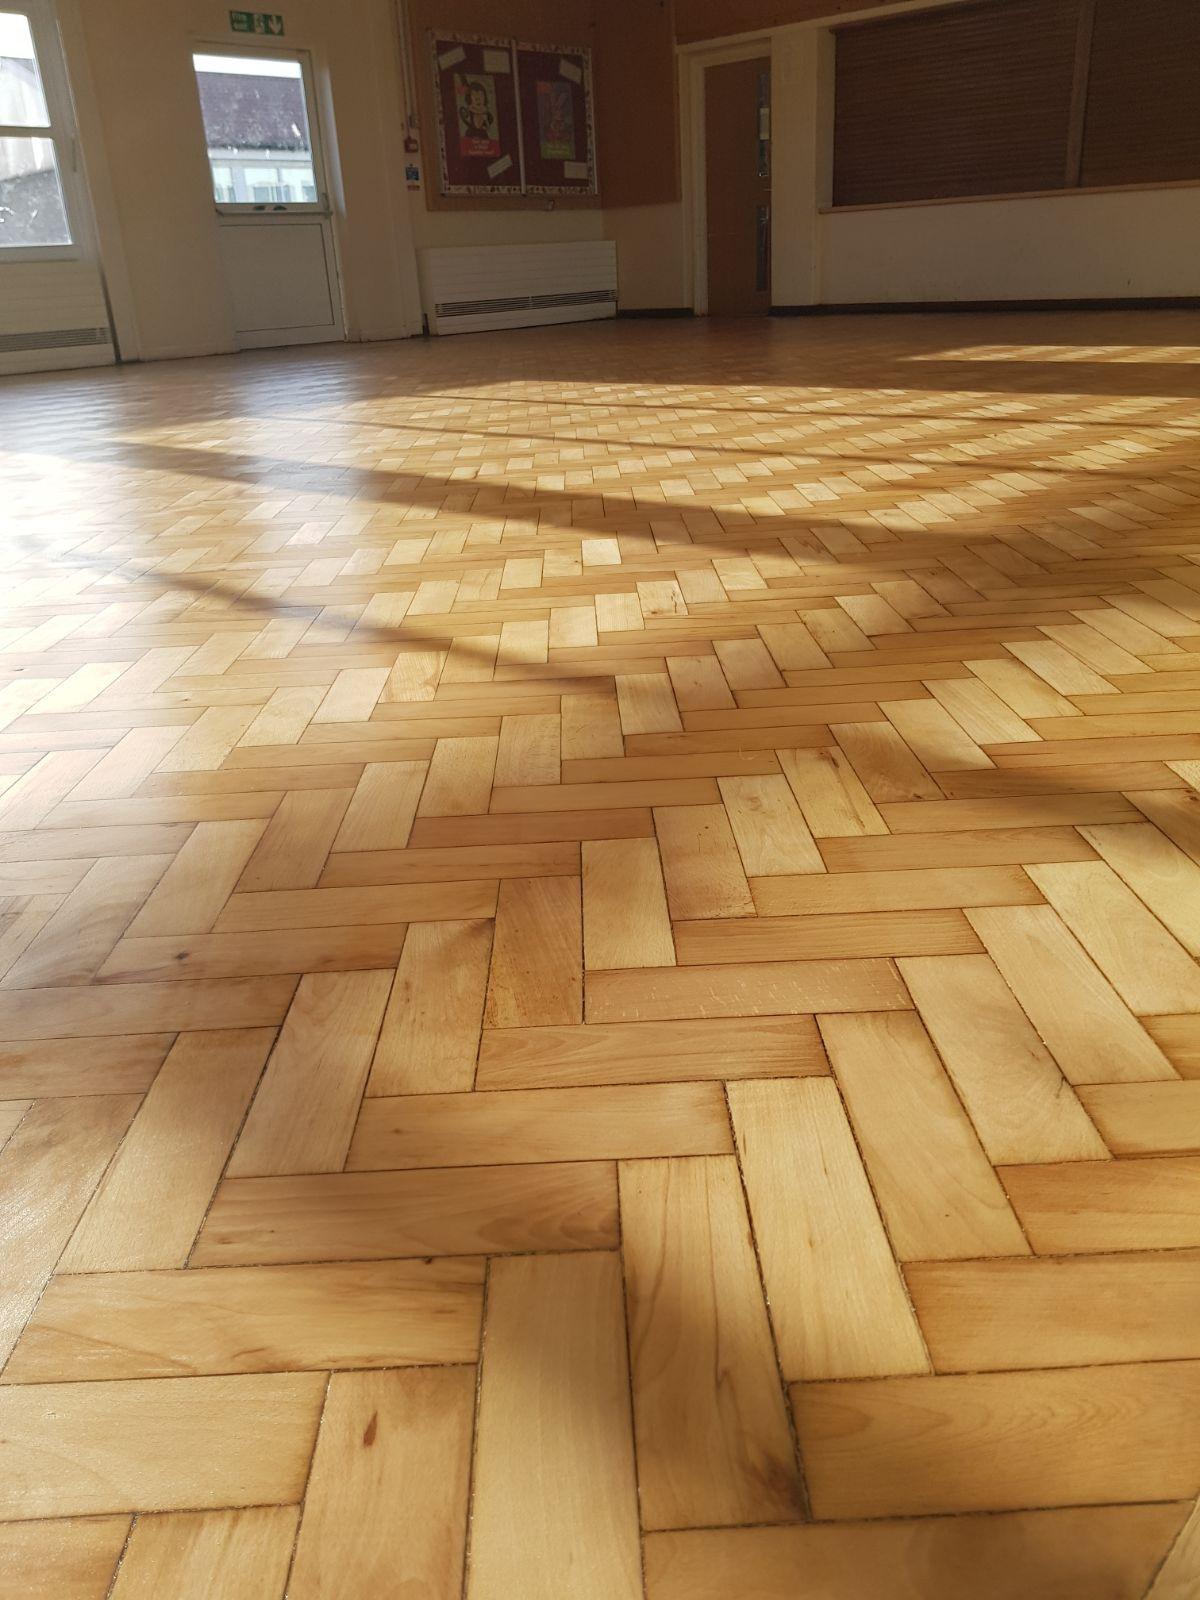 School hall Wooden flooring, Hardwood, Hardwood floors